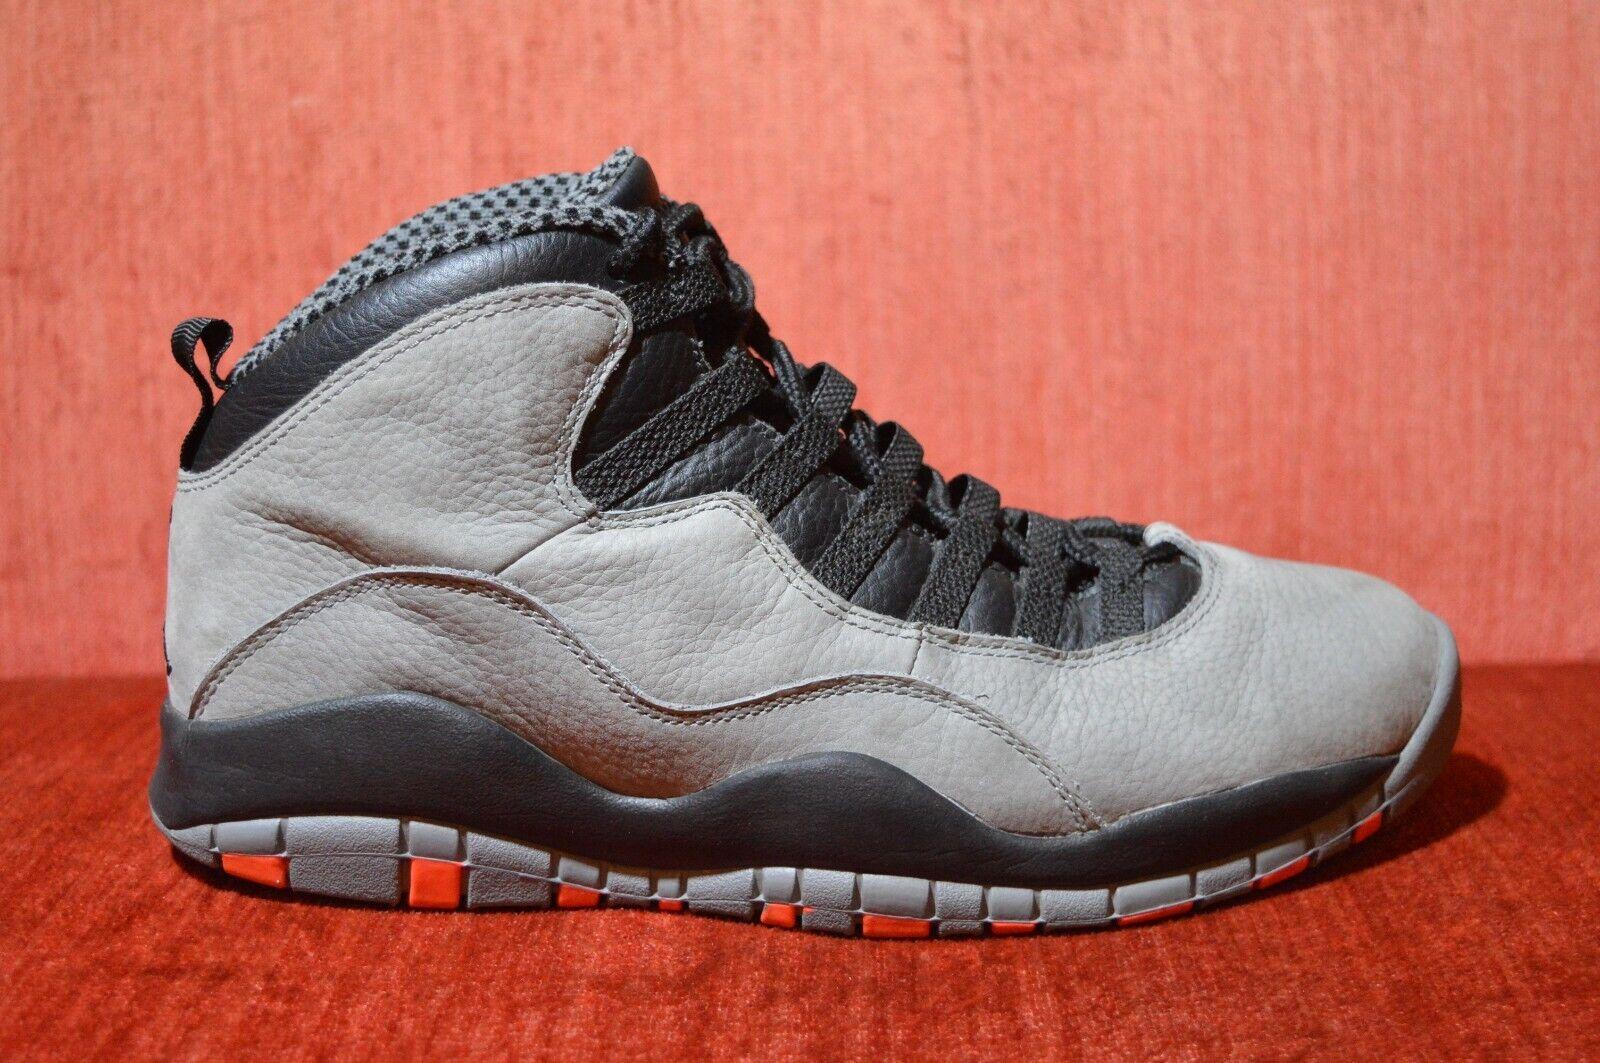 CLEAN Nike Air Jordan Retro 10 X Infrared Cool Grey Size 9.5